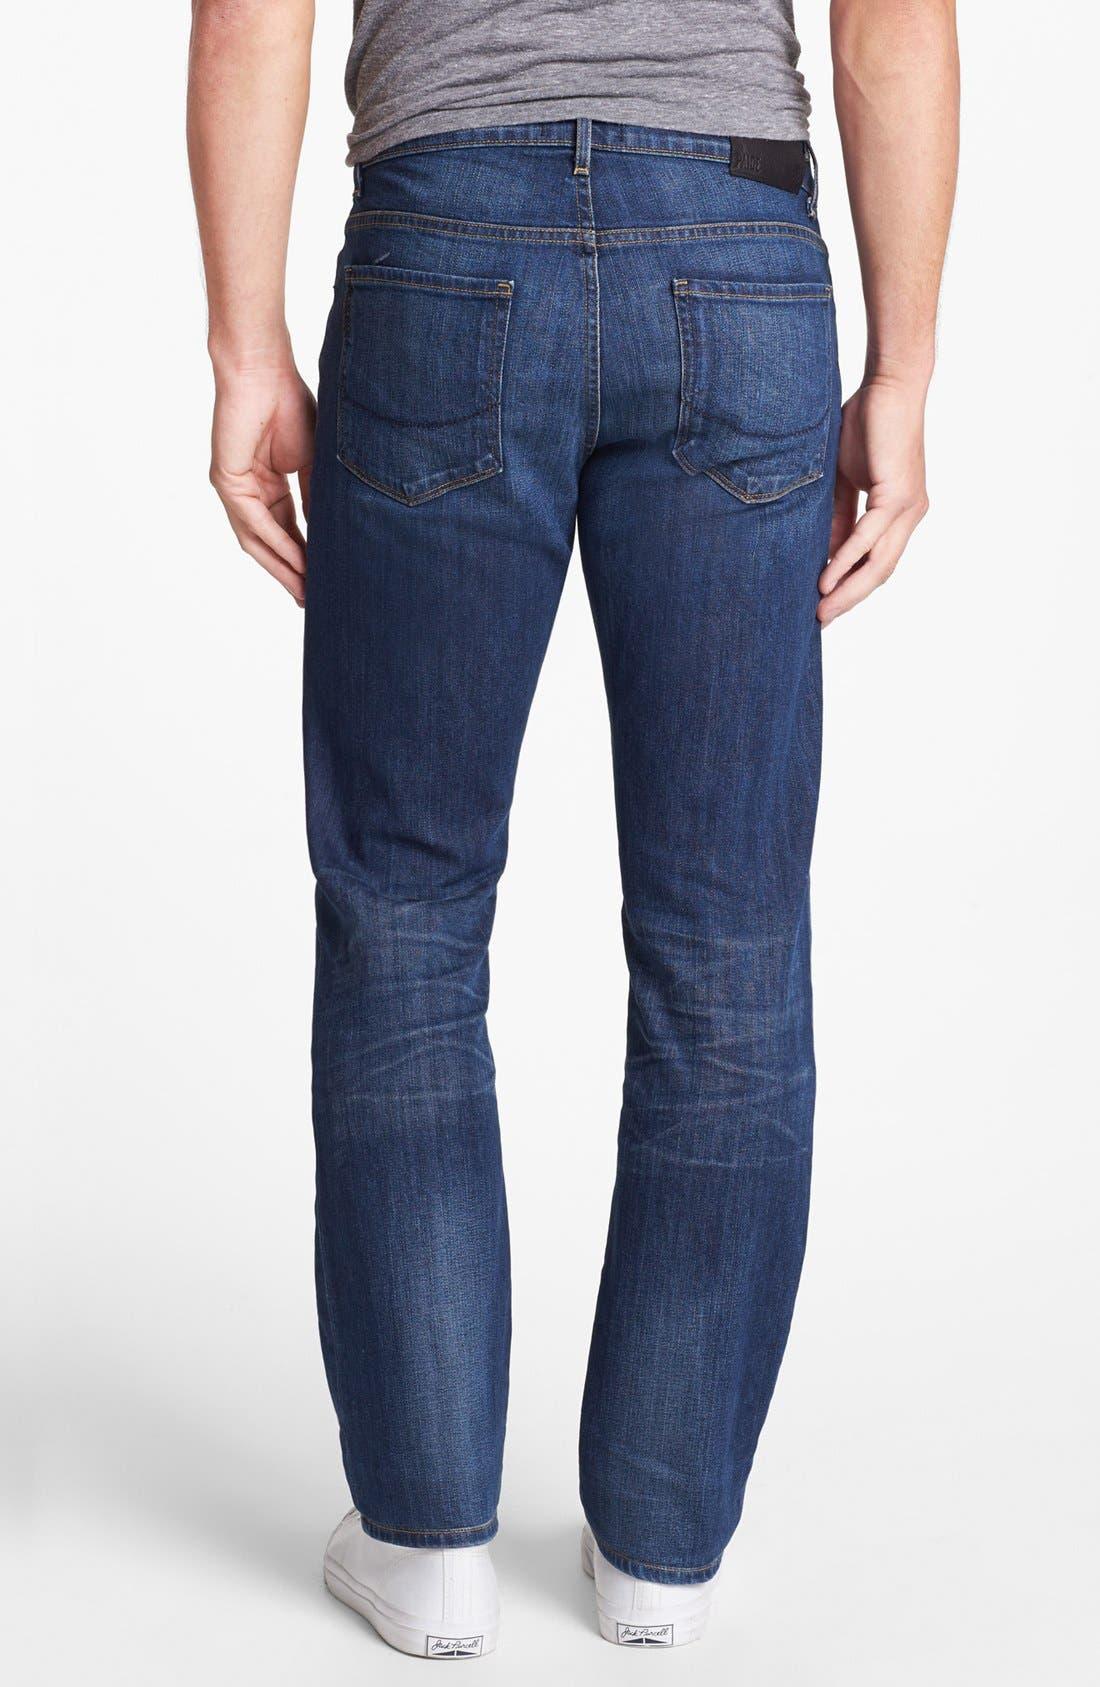 Alternate Image 1 Selected - PAIGE 'Normandie' Slim Fit Jeans (Knuckle)